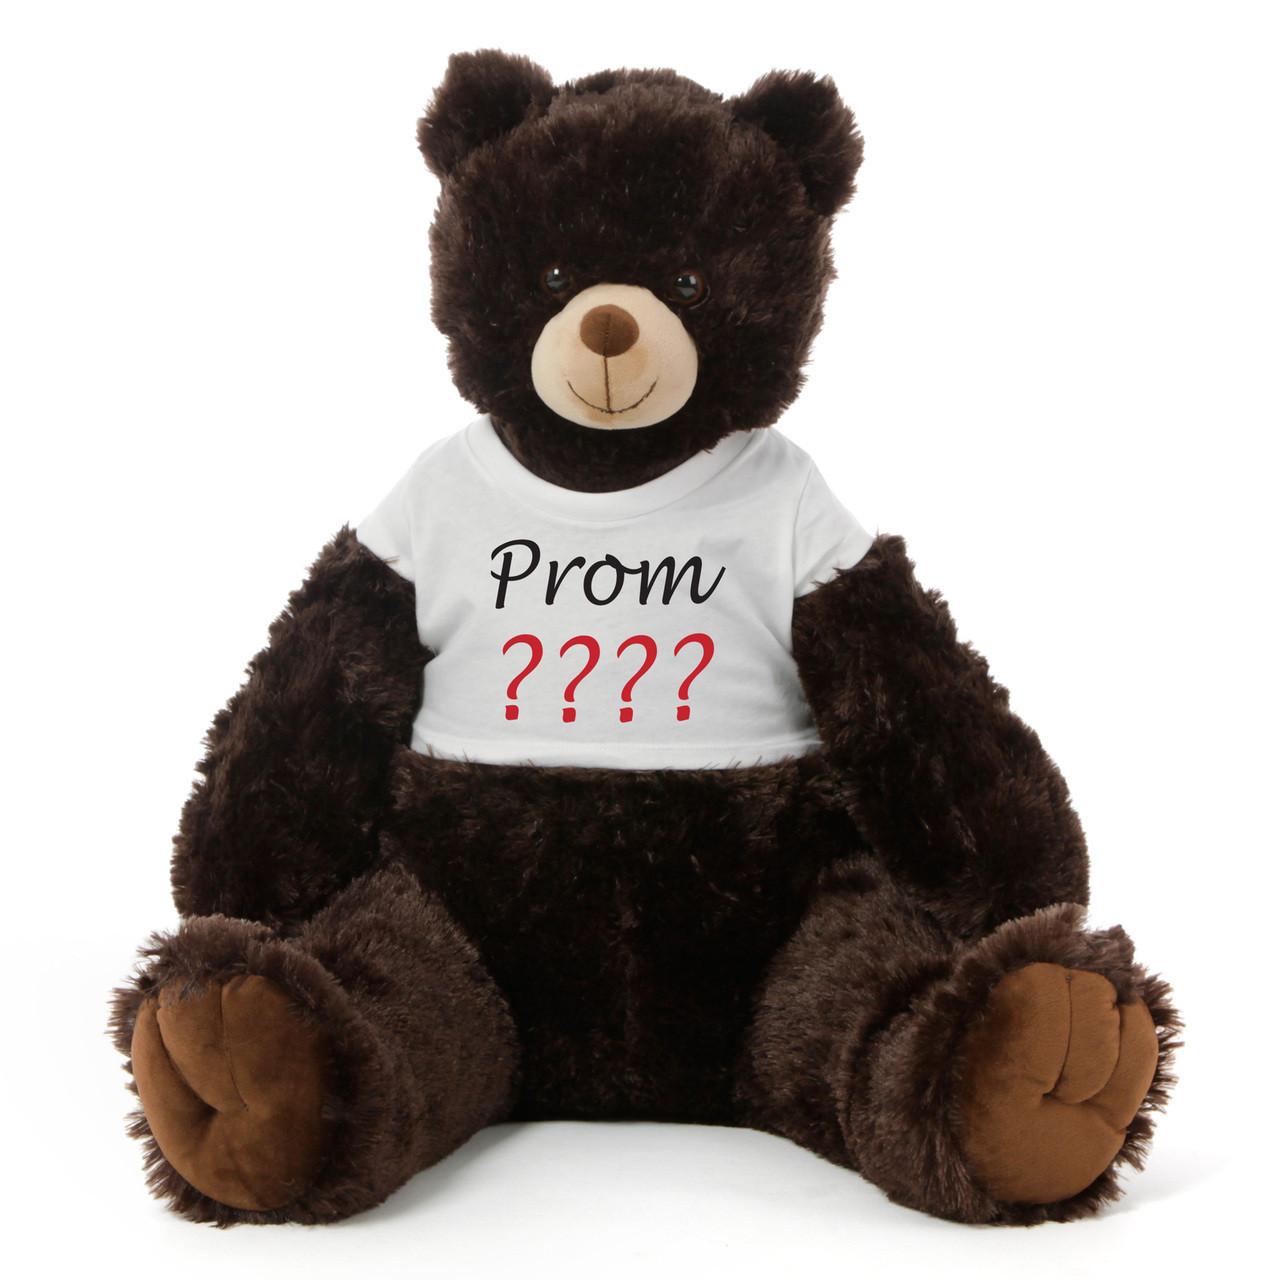 2½ ft Baby Tubs Cuddly Dark Brown Prom Teddy Bear (Prom ????)